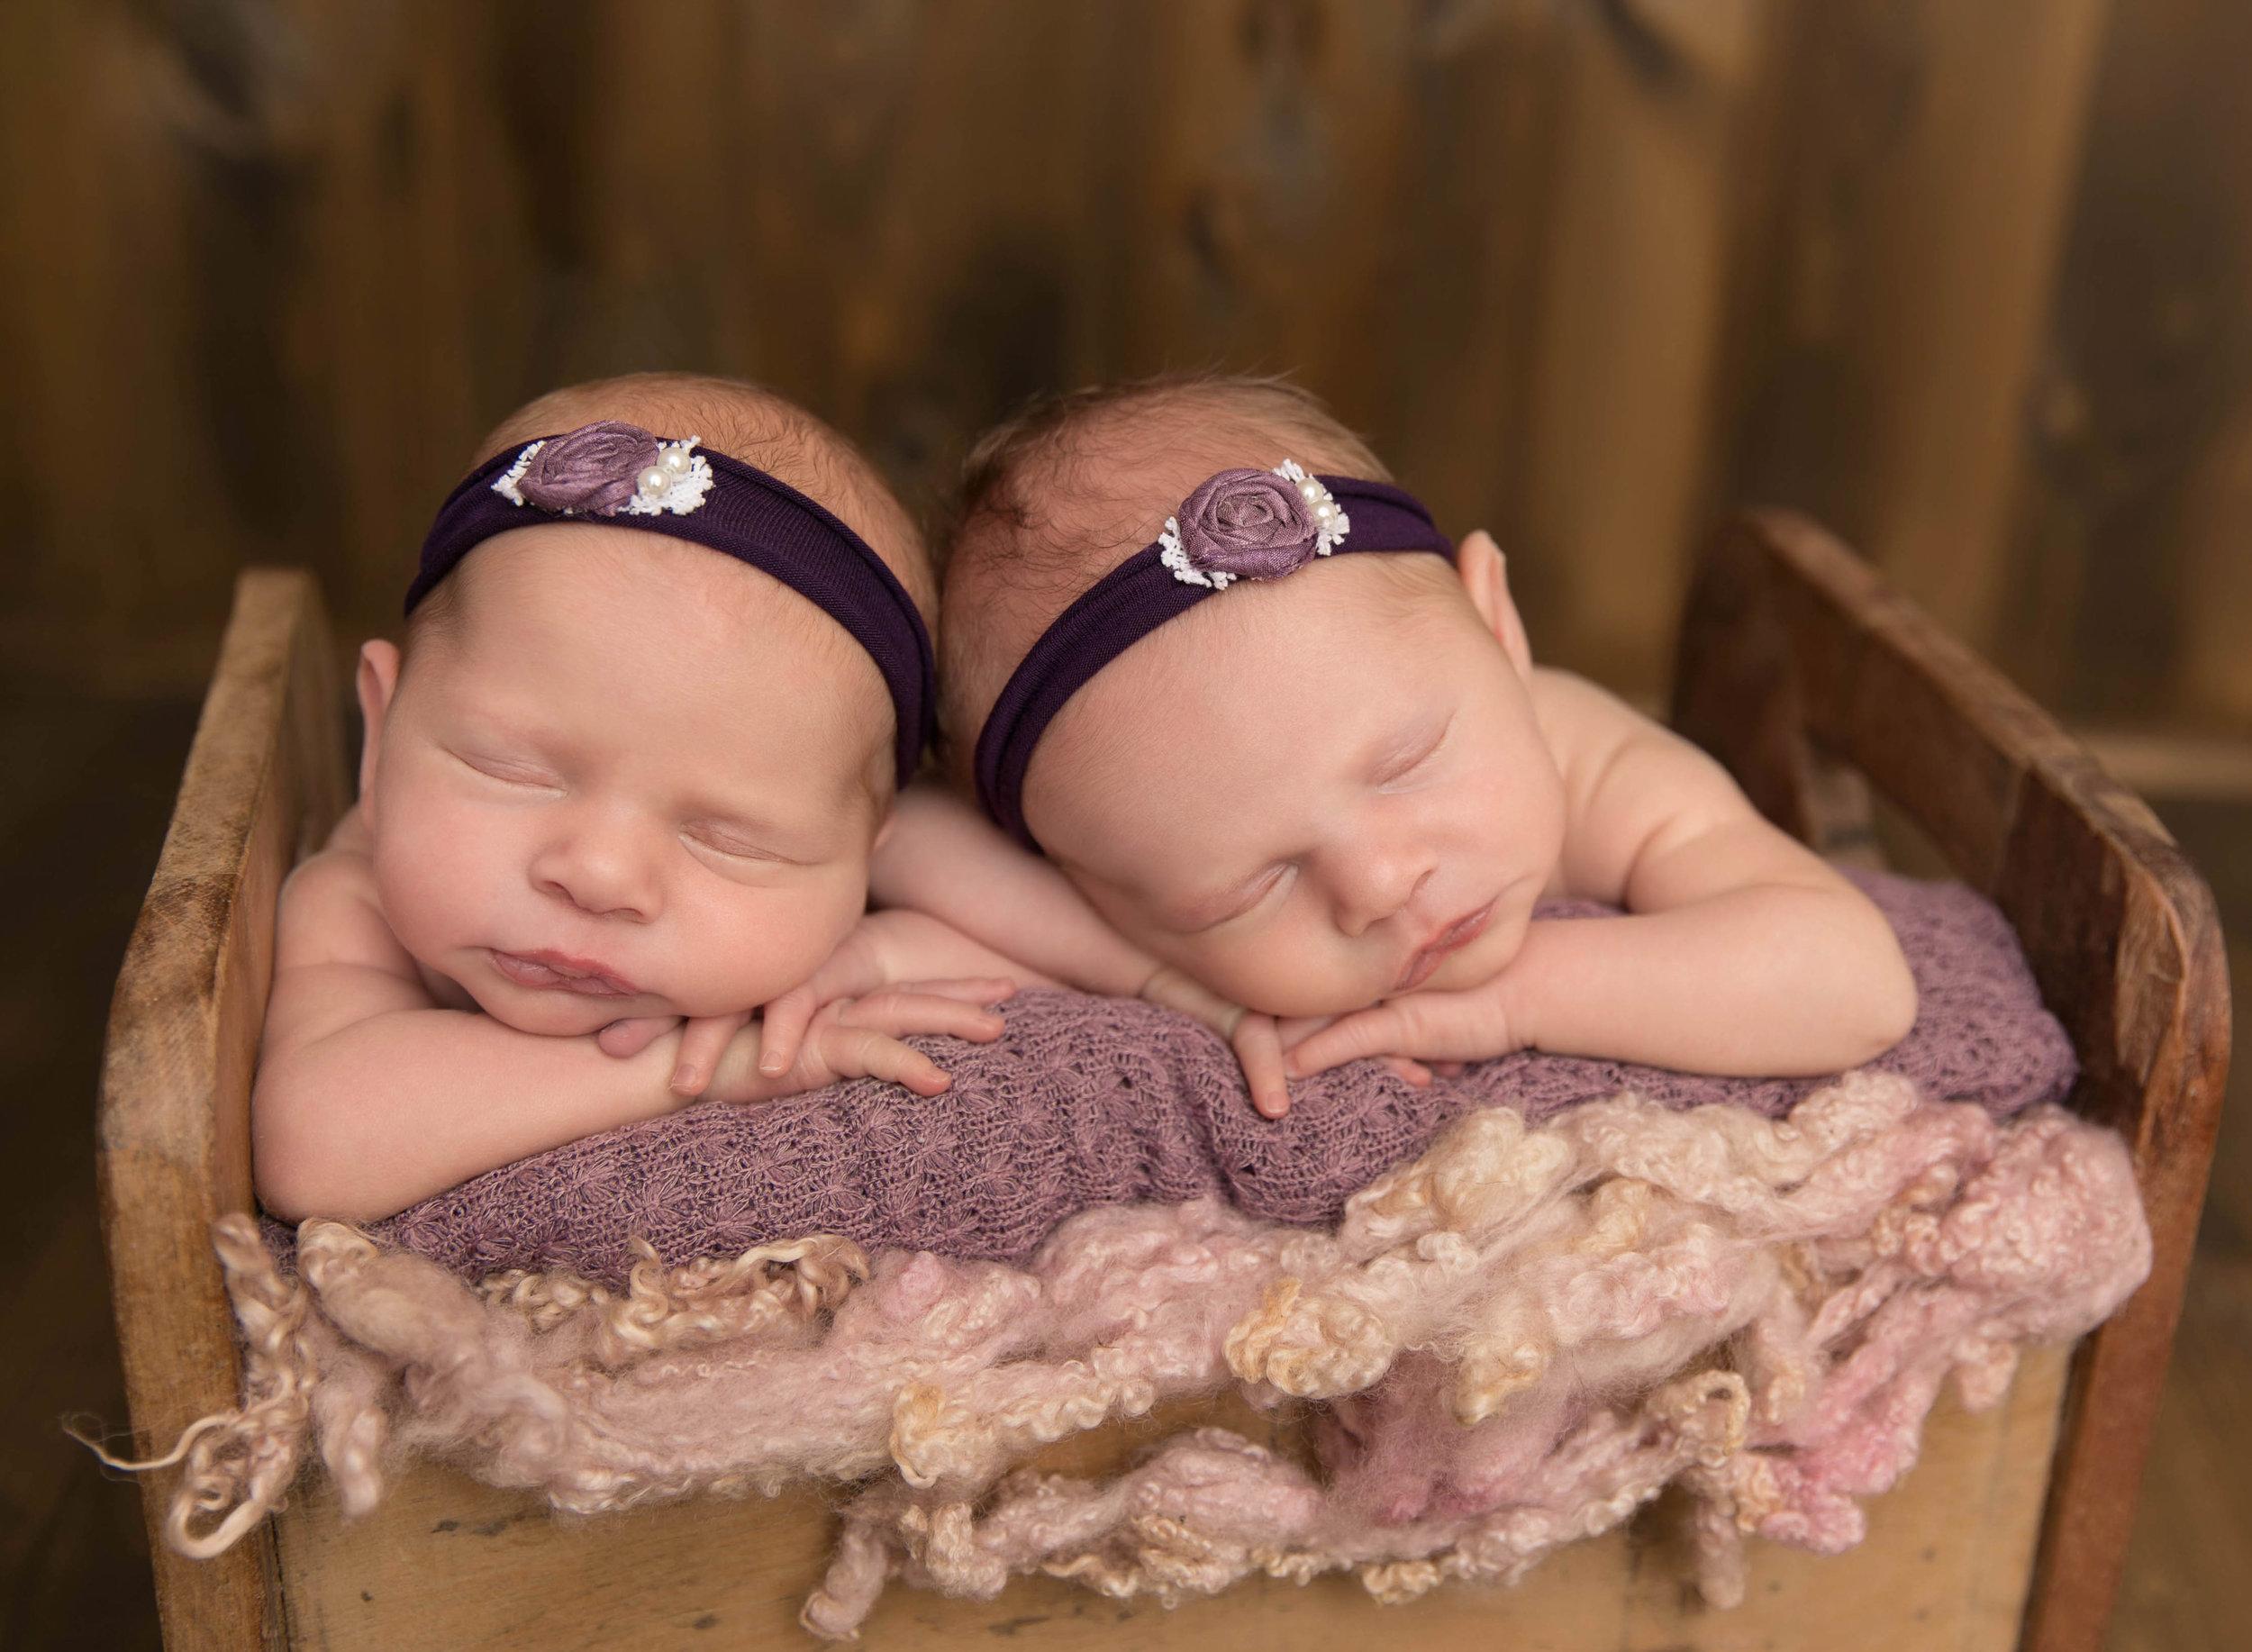 Newborn Photography | Newborn Photographer | Kawartha Lakes Photographer | Lindsay Photographer | Lindsay Ontario Photographer | Kawartha Lakes Photographer | Kawartha Lakes Favourite Photographer | Readers Choice Awards | Morgan Bress Photography | Twins | Twin Newborn Session | Multiple Births | Newborn Twin Posing